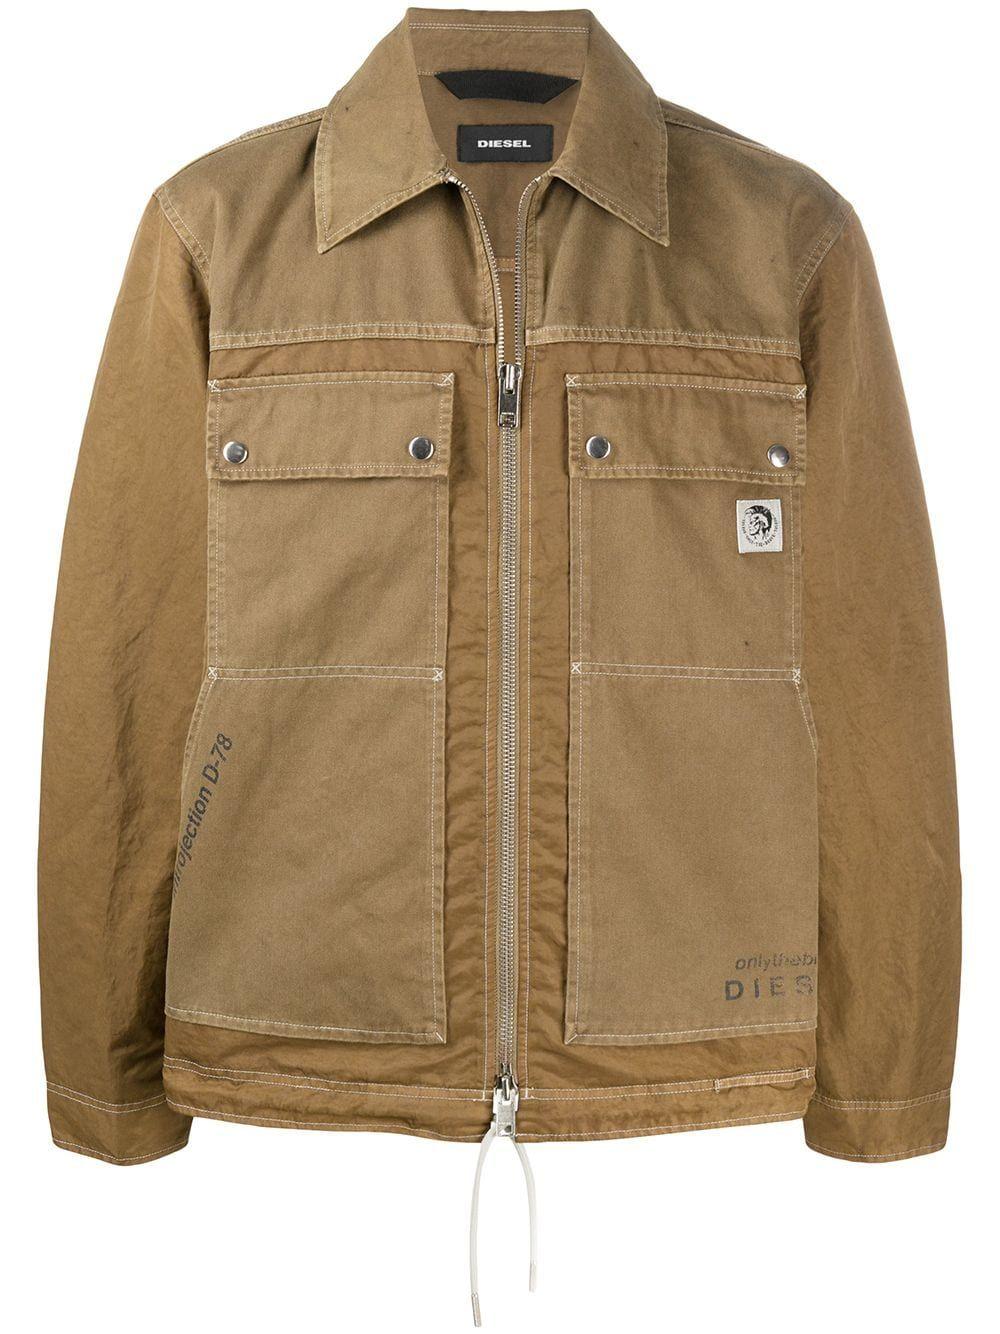 Diesel Stitch Detail Workwear Jacket Farfetch In 2021 Jackets Clothing Design Details Work Wear [ 1334 x 1000 Pixel ]